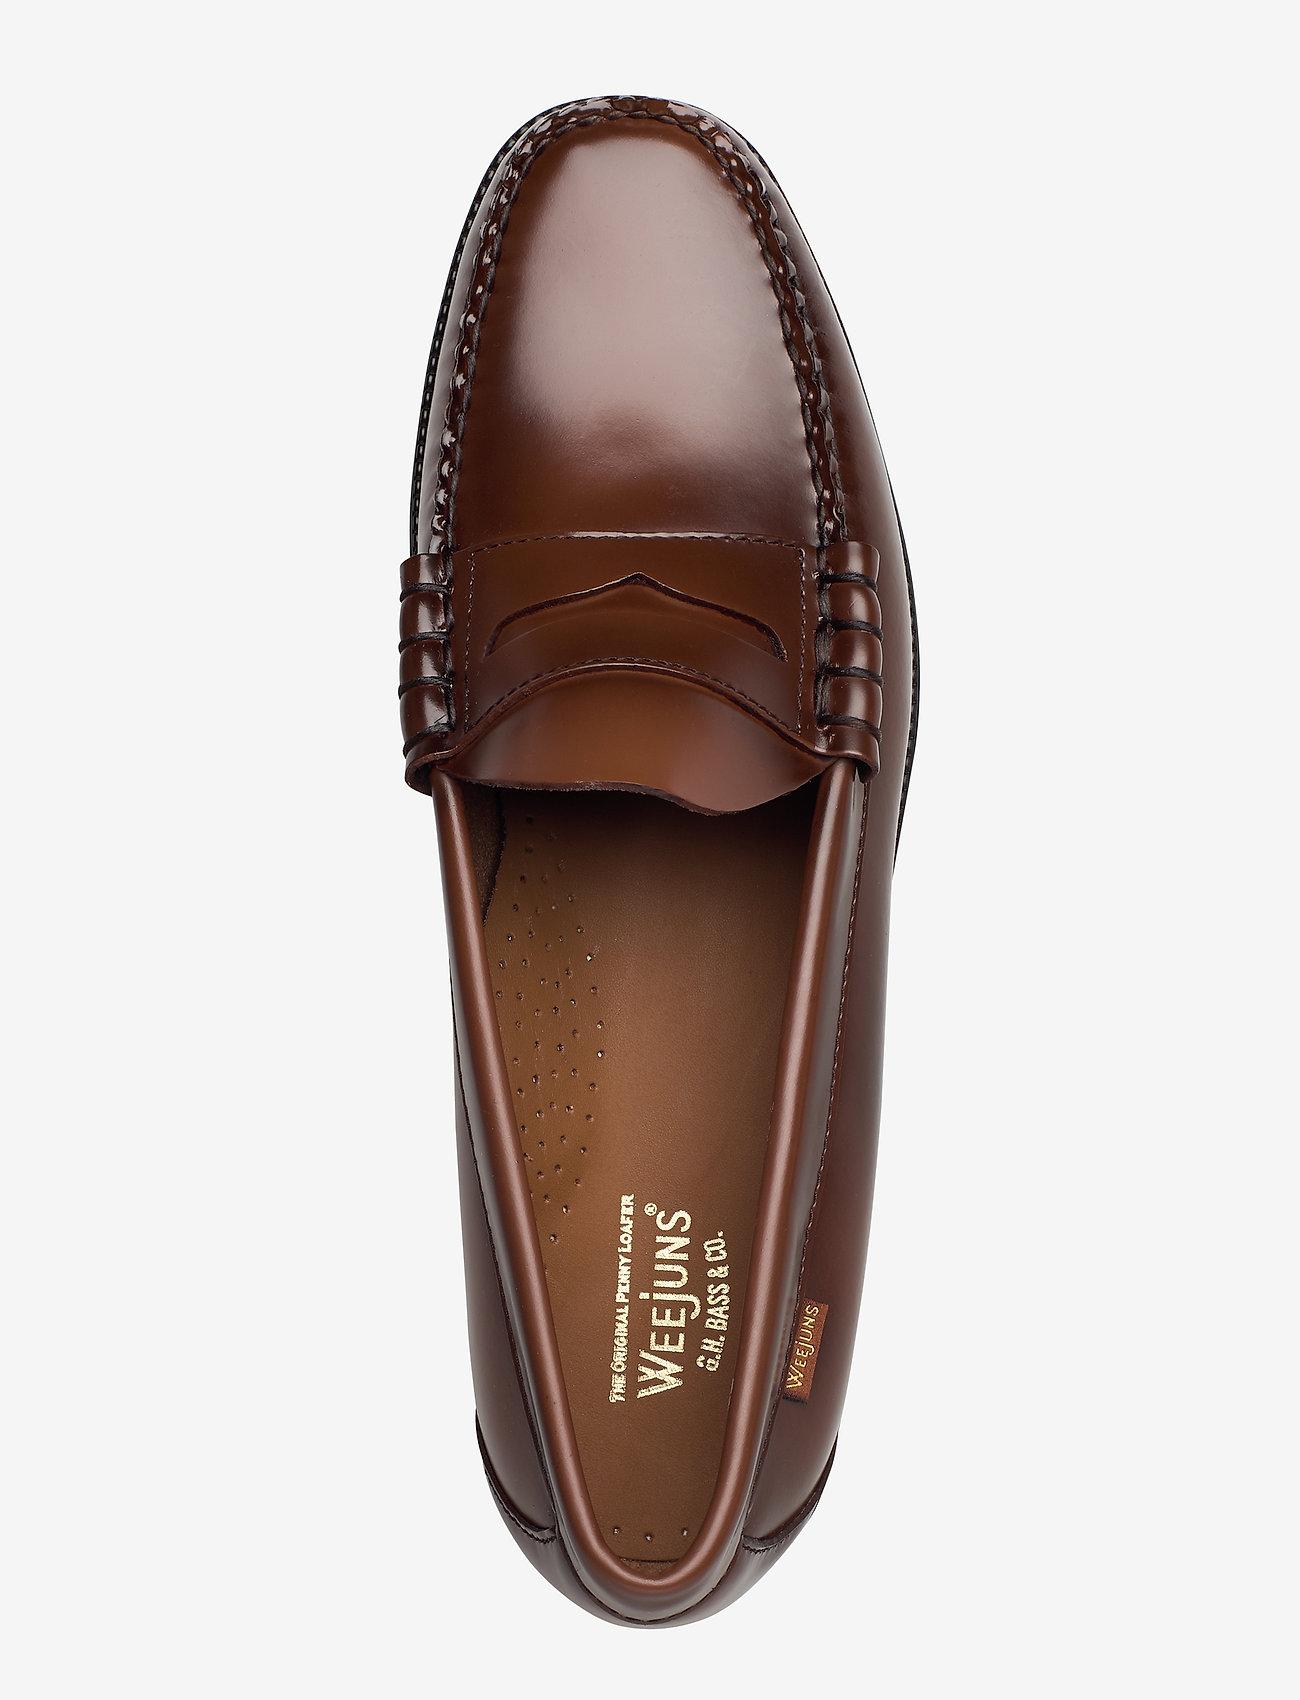 G.H. BASS - GH WEEJUN II LARSON MOC PENNY - skor - mid brown lthr - 3